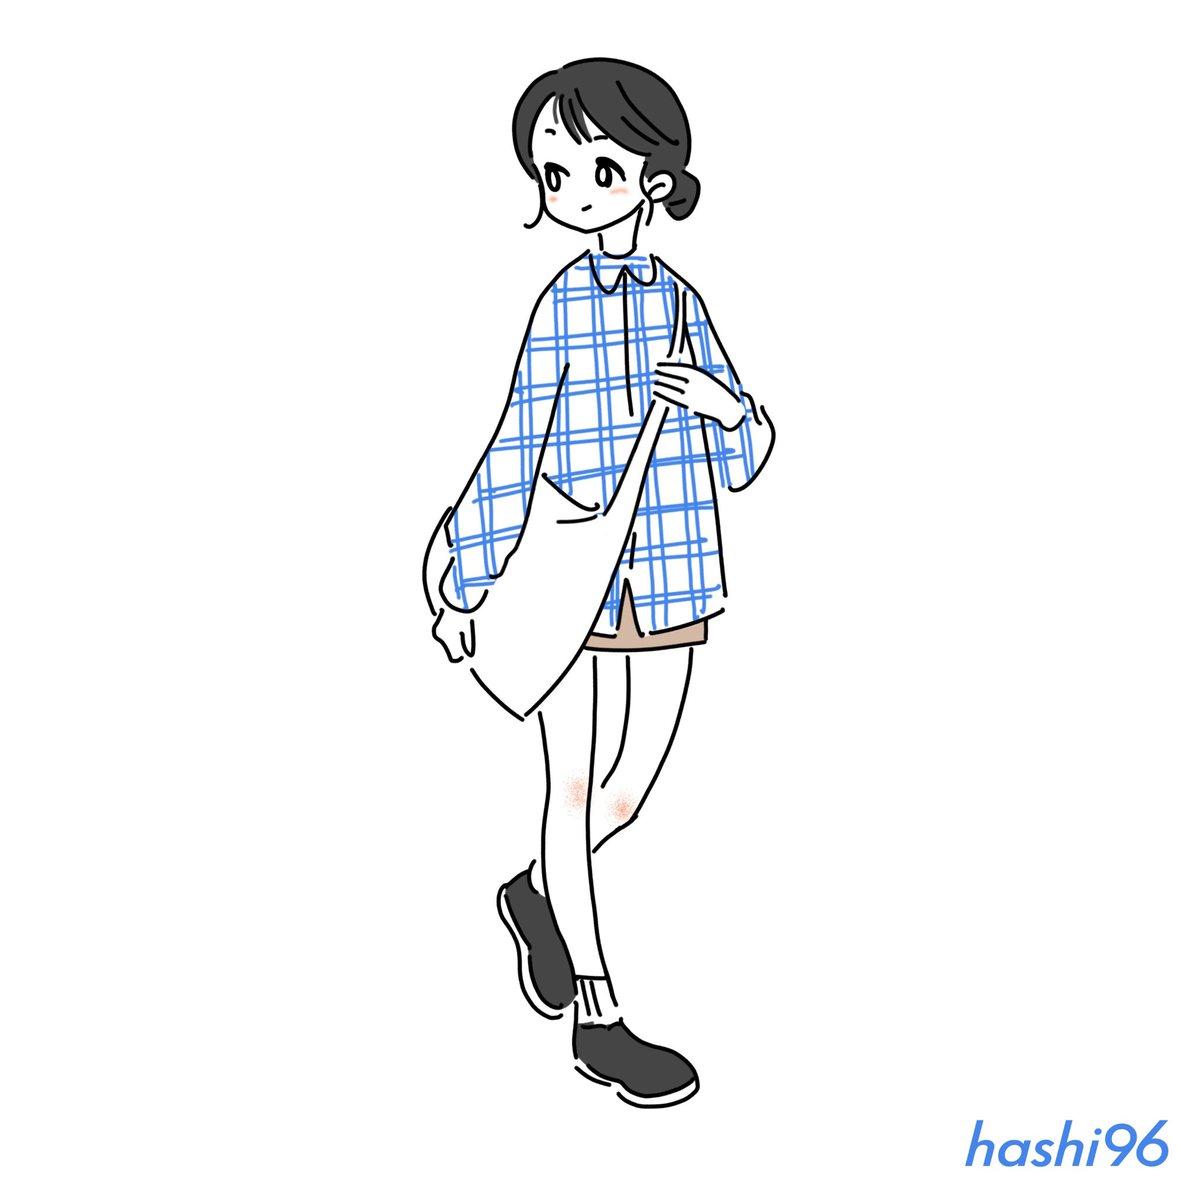 #illustration #fashion #drawings #artwork #hashi96 #イラスト #女の子 #イラスト練習